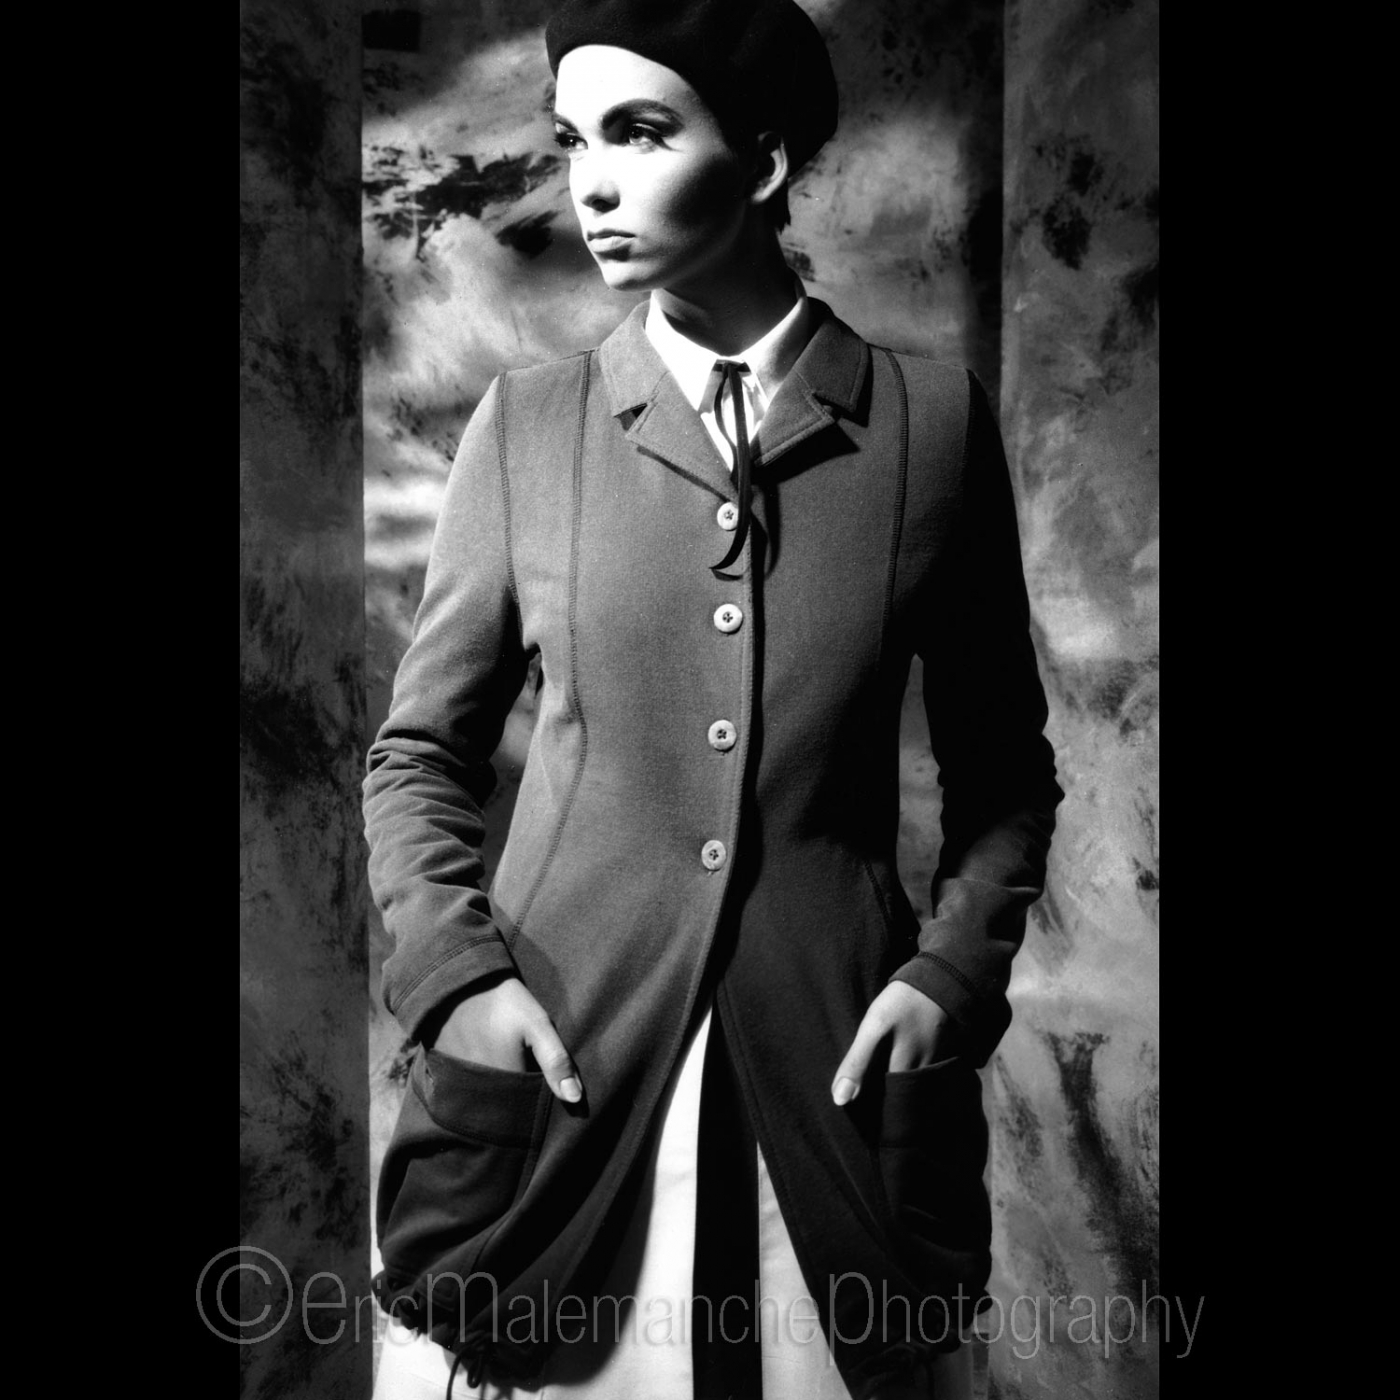 http://www.ericmalemanche.com/imagess/topics/fashion-90-s/liste/Fashion-Carbur-02.jpg